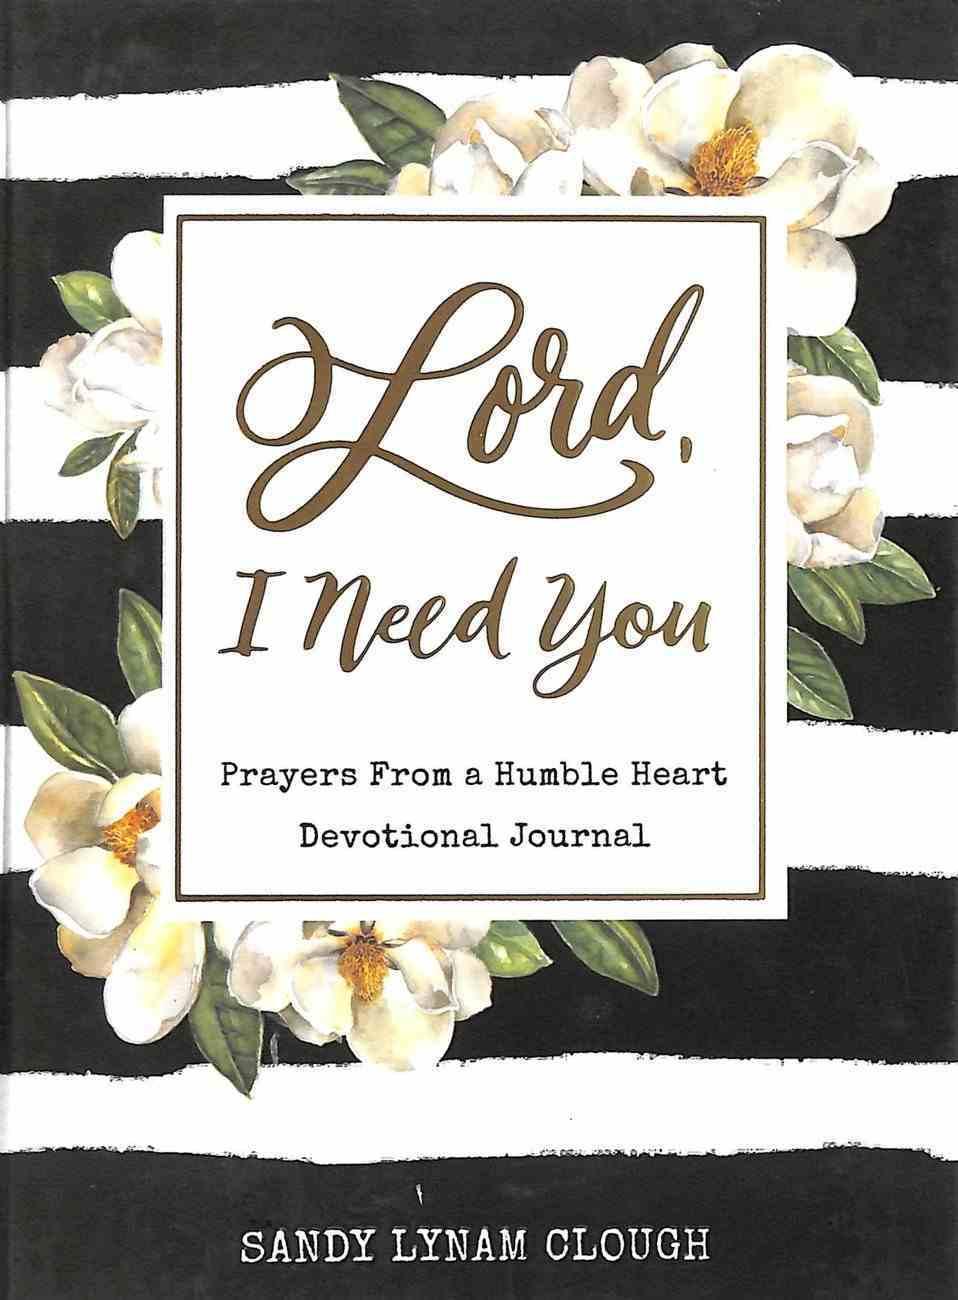 Lord, I Need You: Prayers From a Humble Heart Devotional Journal Hardback